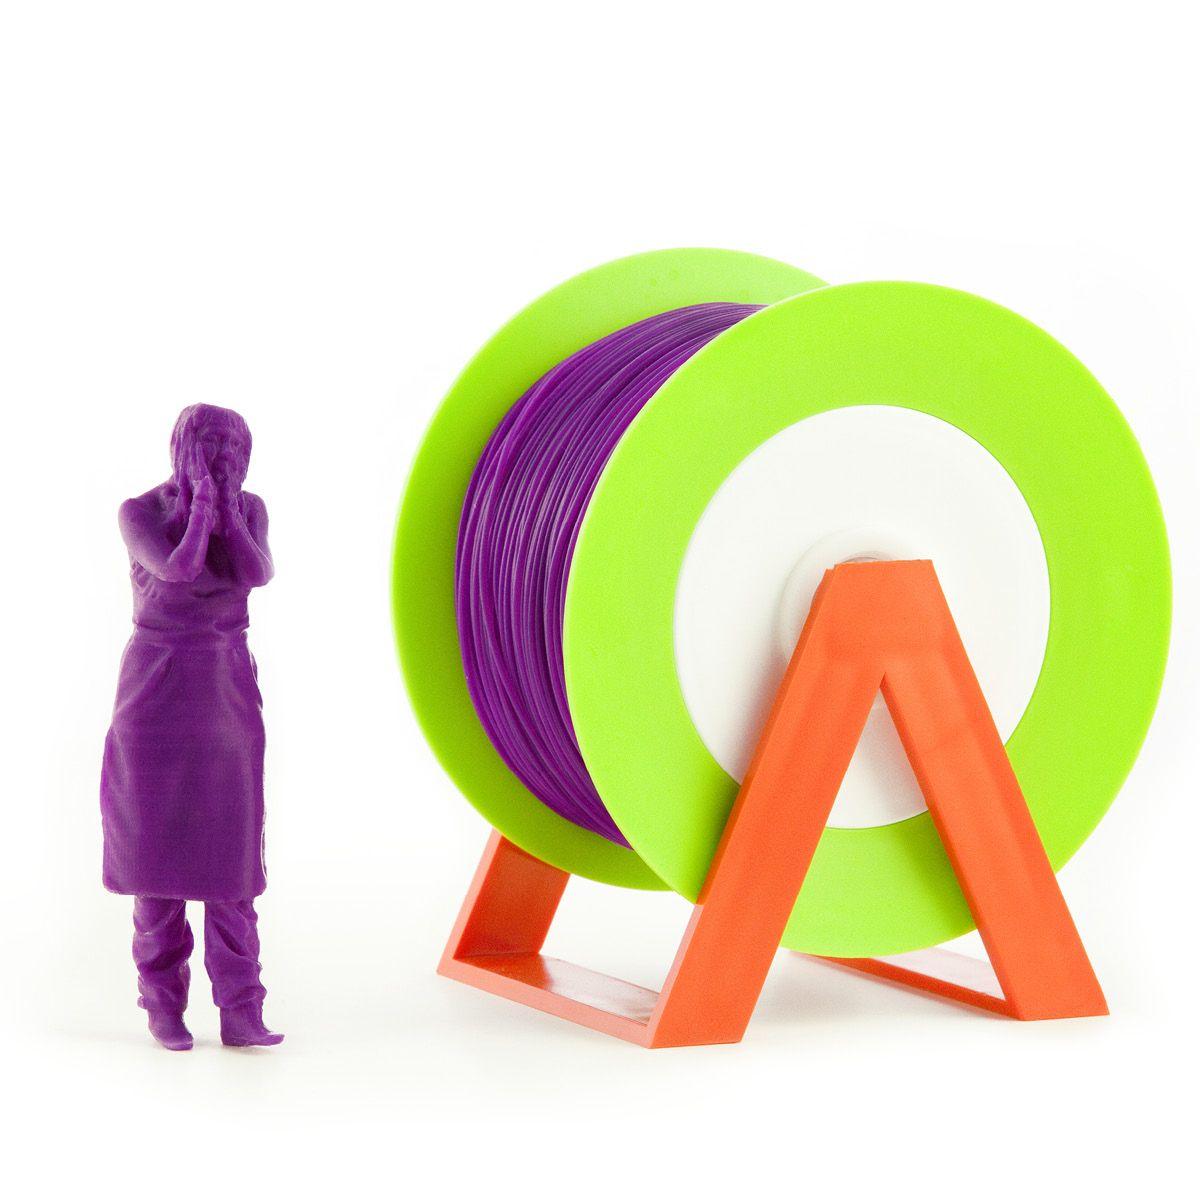 PLA Filament | Color: Violet